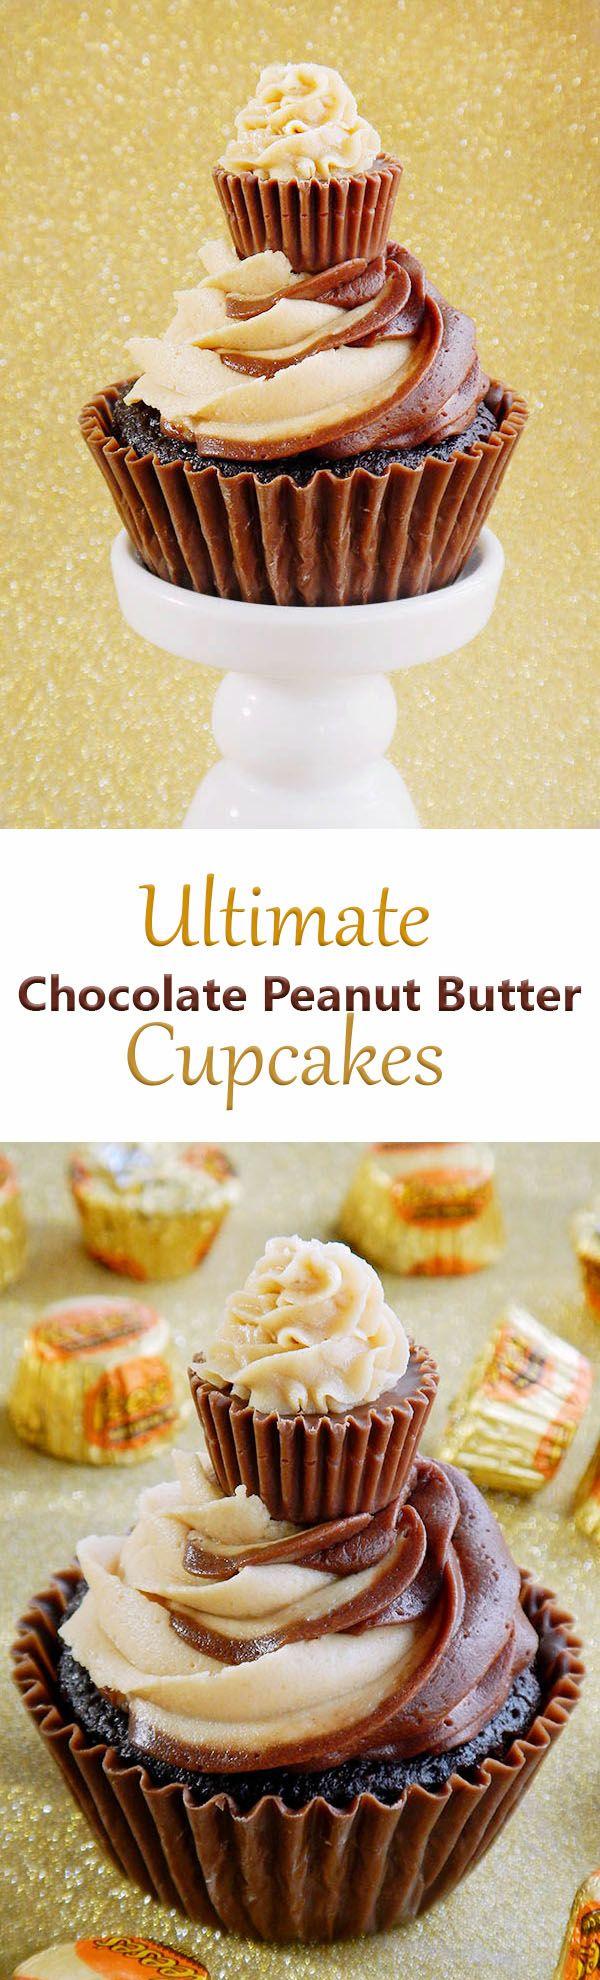 "The best chocolate peanut butter cupcakes. Chocolate cupcakes with peanut butter filling, chocolate and peanut butter swirl frosting, mini ""cupcake"" toppers and edible cupcake wrappers. A peanut butter lover's dream!  #UltimateCupcake"